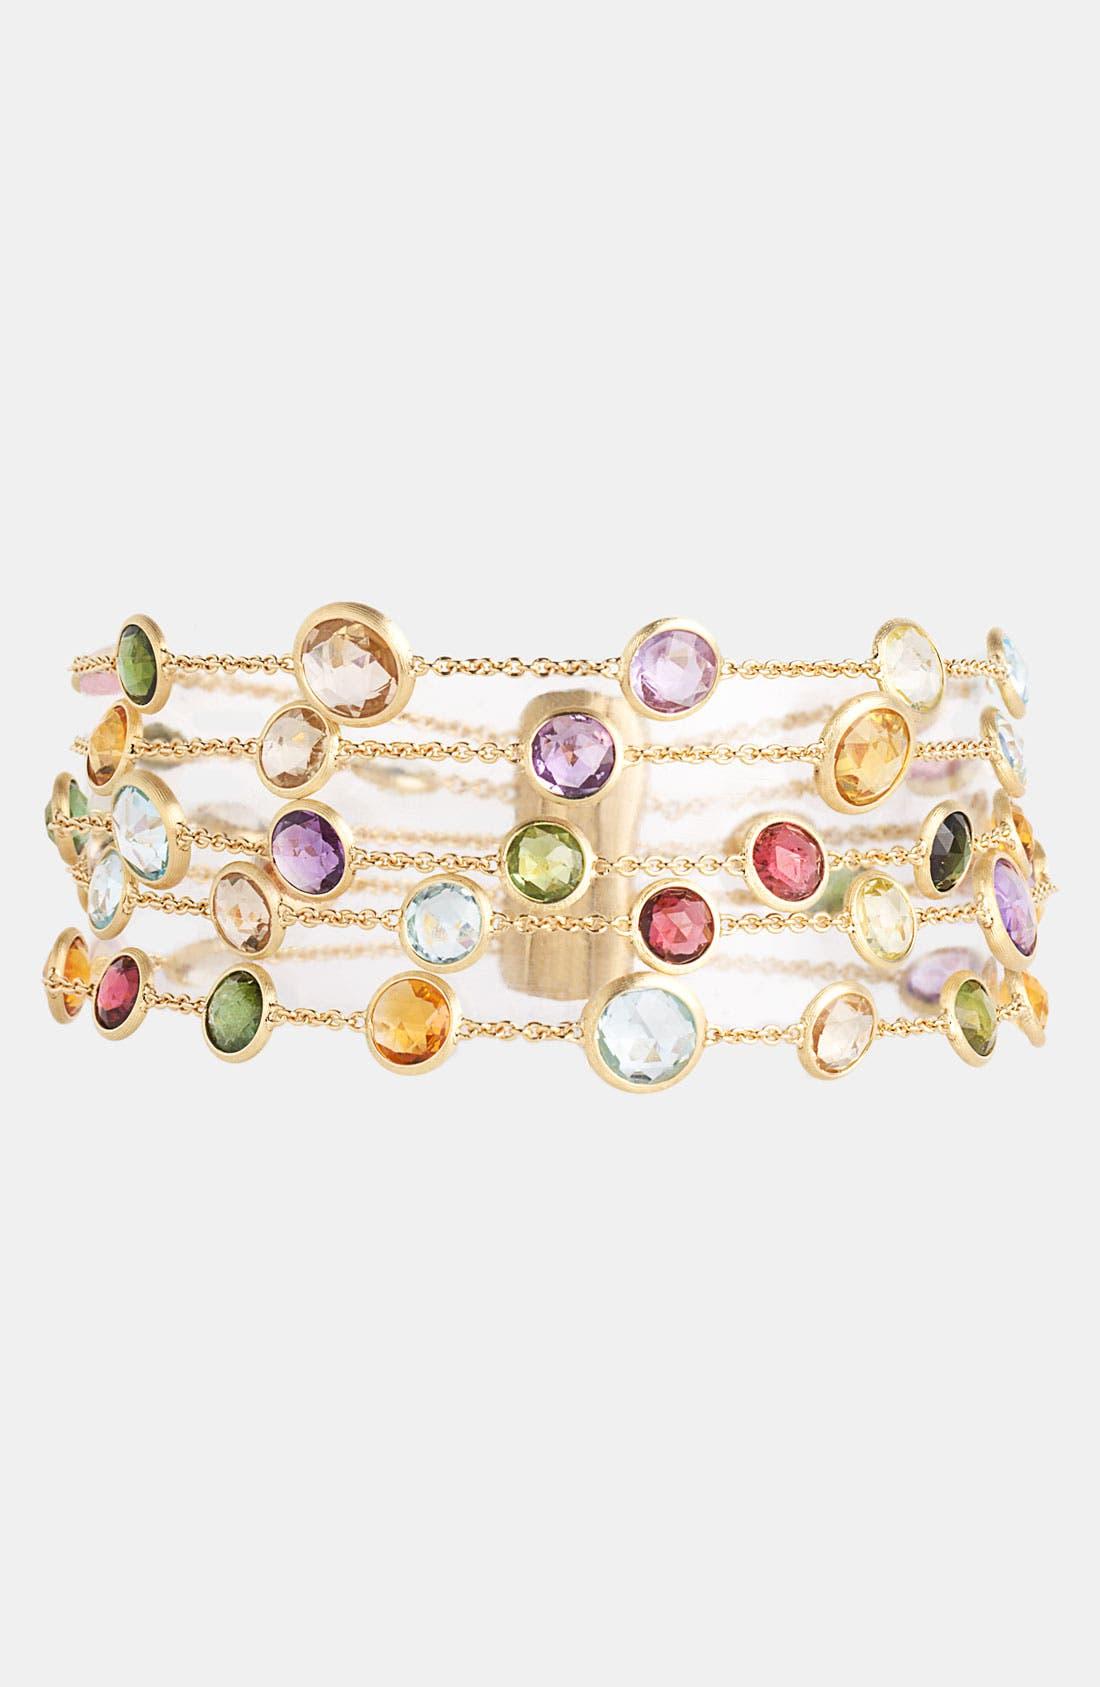 Main Image - Marco Bicego 'Mini Jaipur' 5-Strand Bracelet